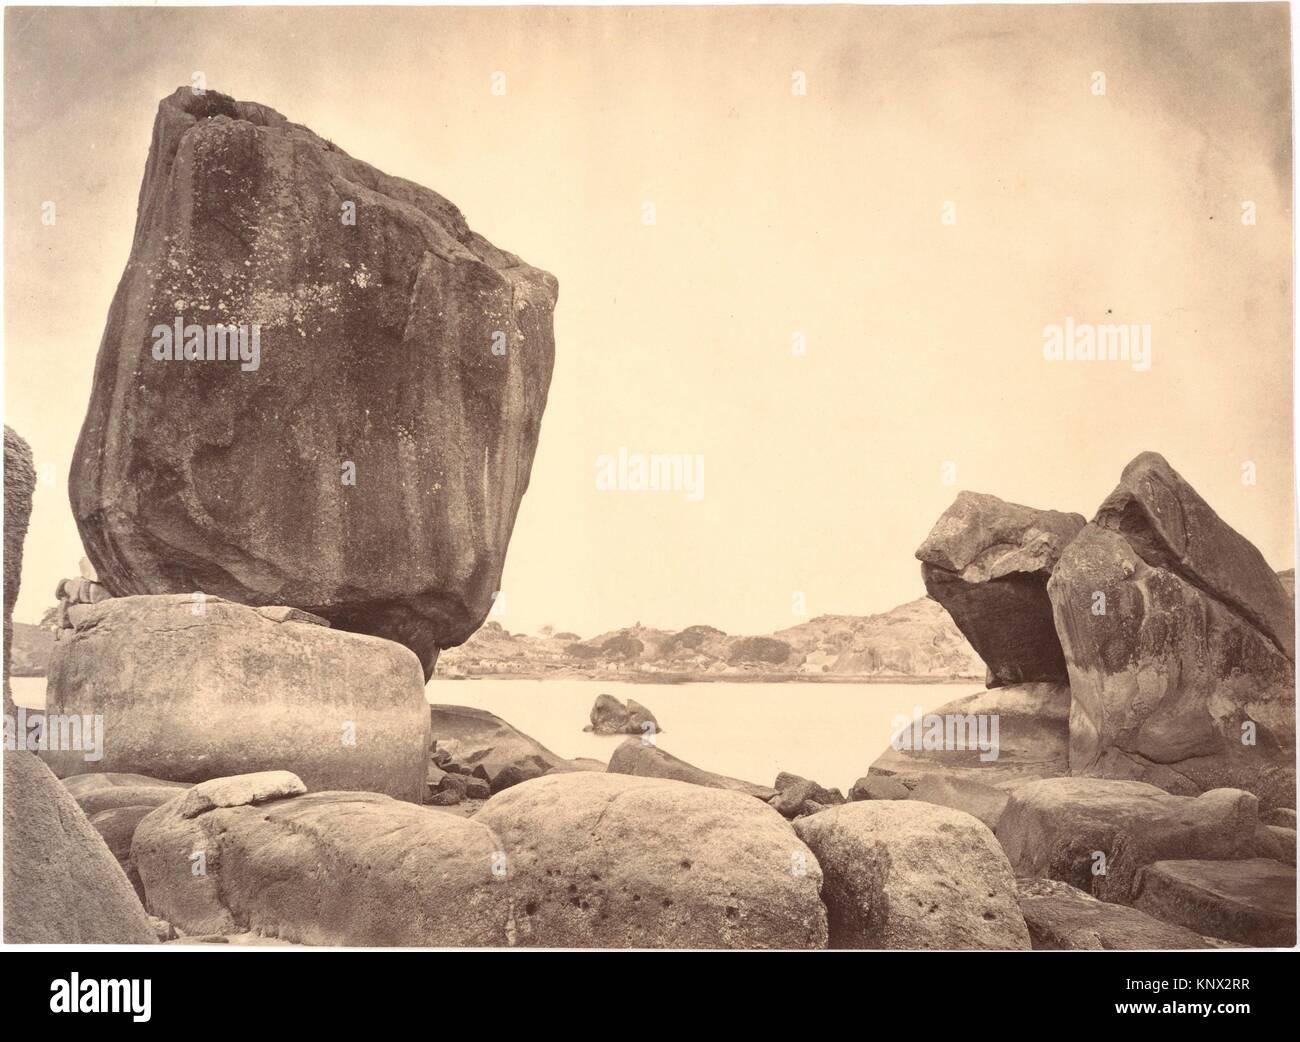 Peculiar shaped Rocks on Roolangsoo Island, Amoy. Artist: John Thomson (British, Edinburgh, Scotland 1837-1921 London); - Stock Image